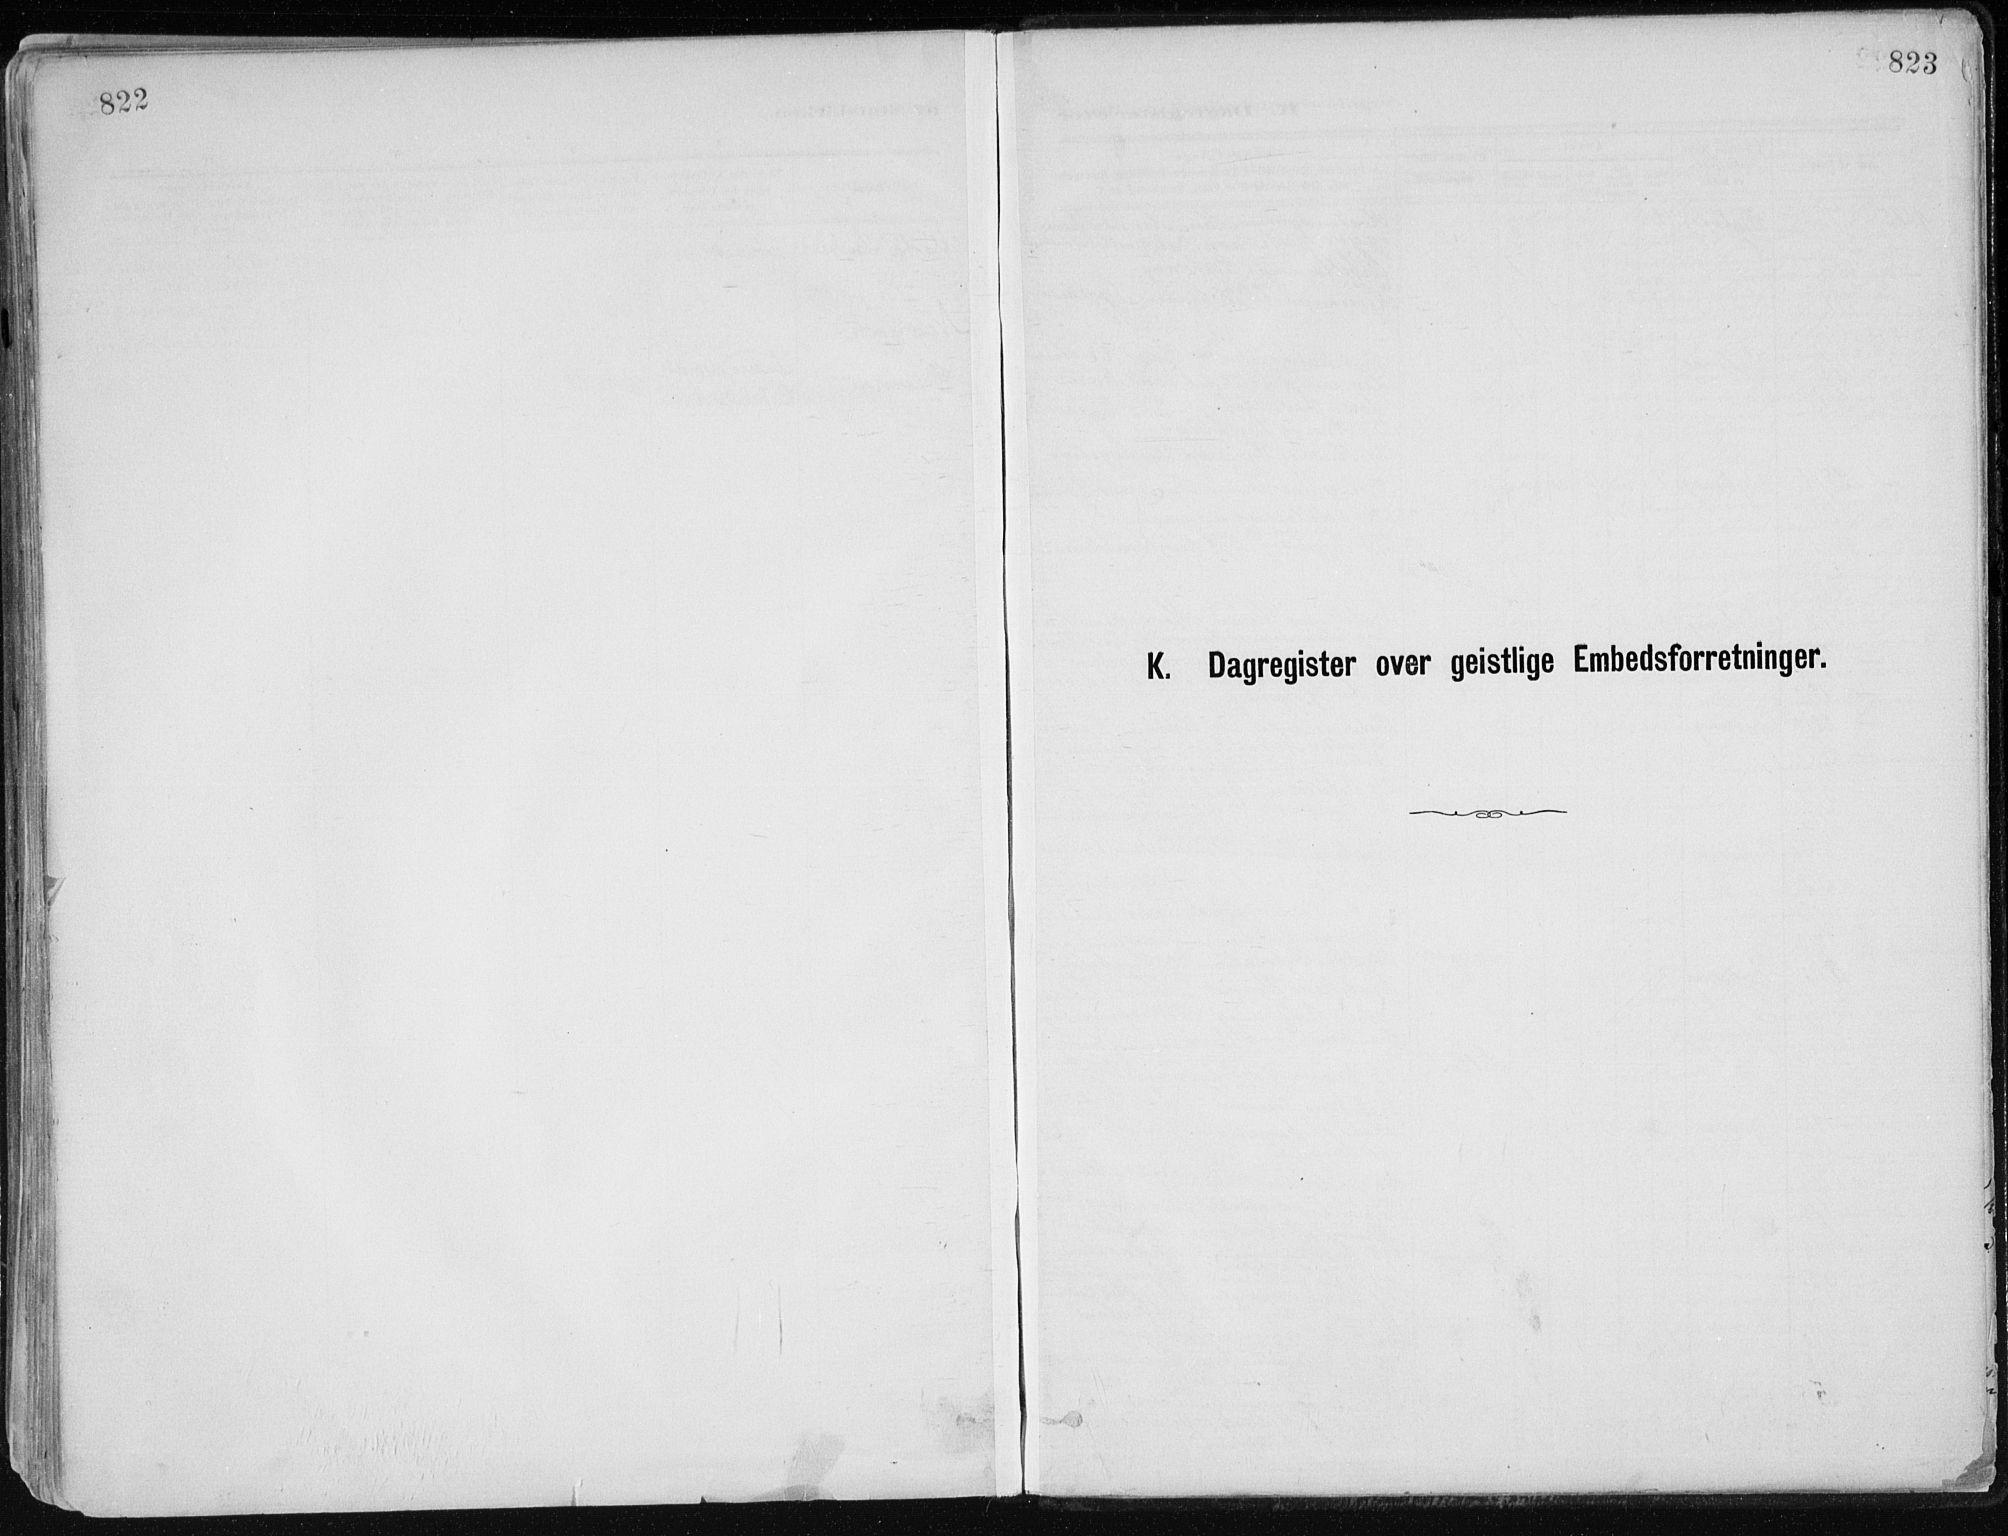 SAK, Dypvåg sokneprestkontor, F/Fa/Faa/L0008: Ministerialbok nr. A 8, 1885-1906, s. 822-823